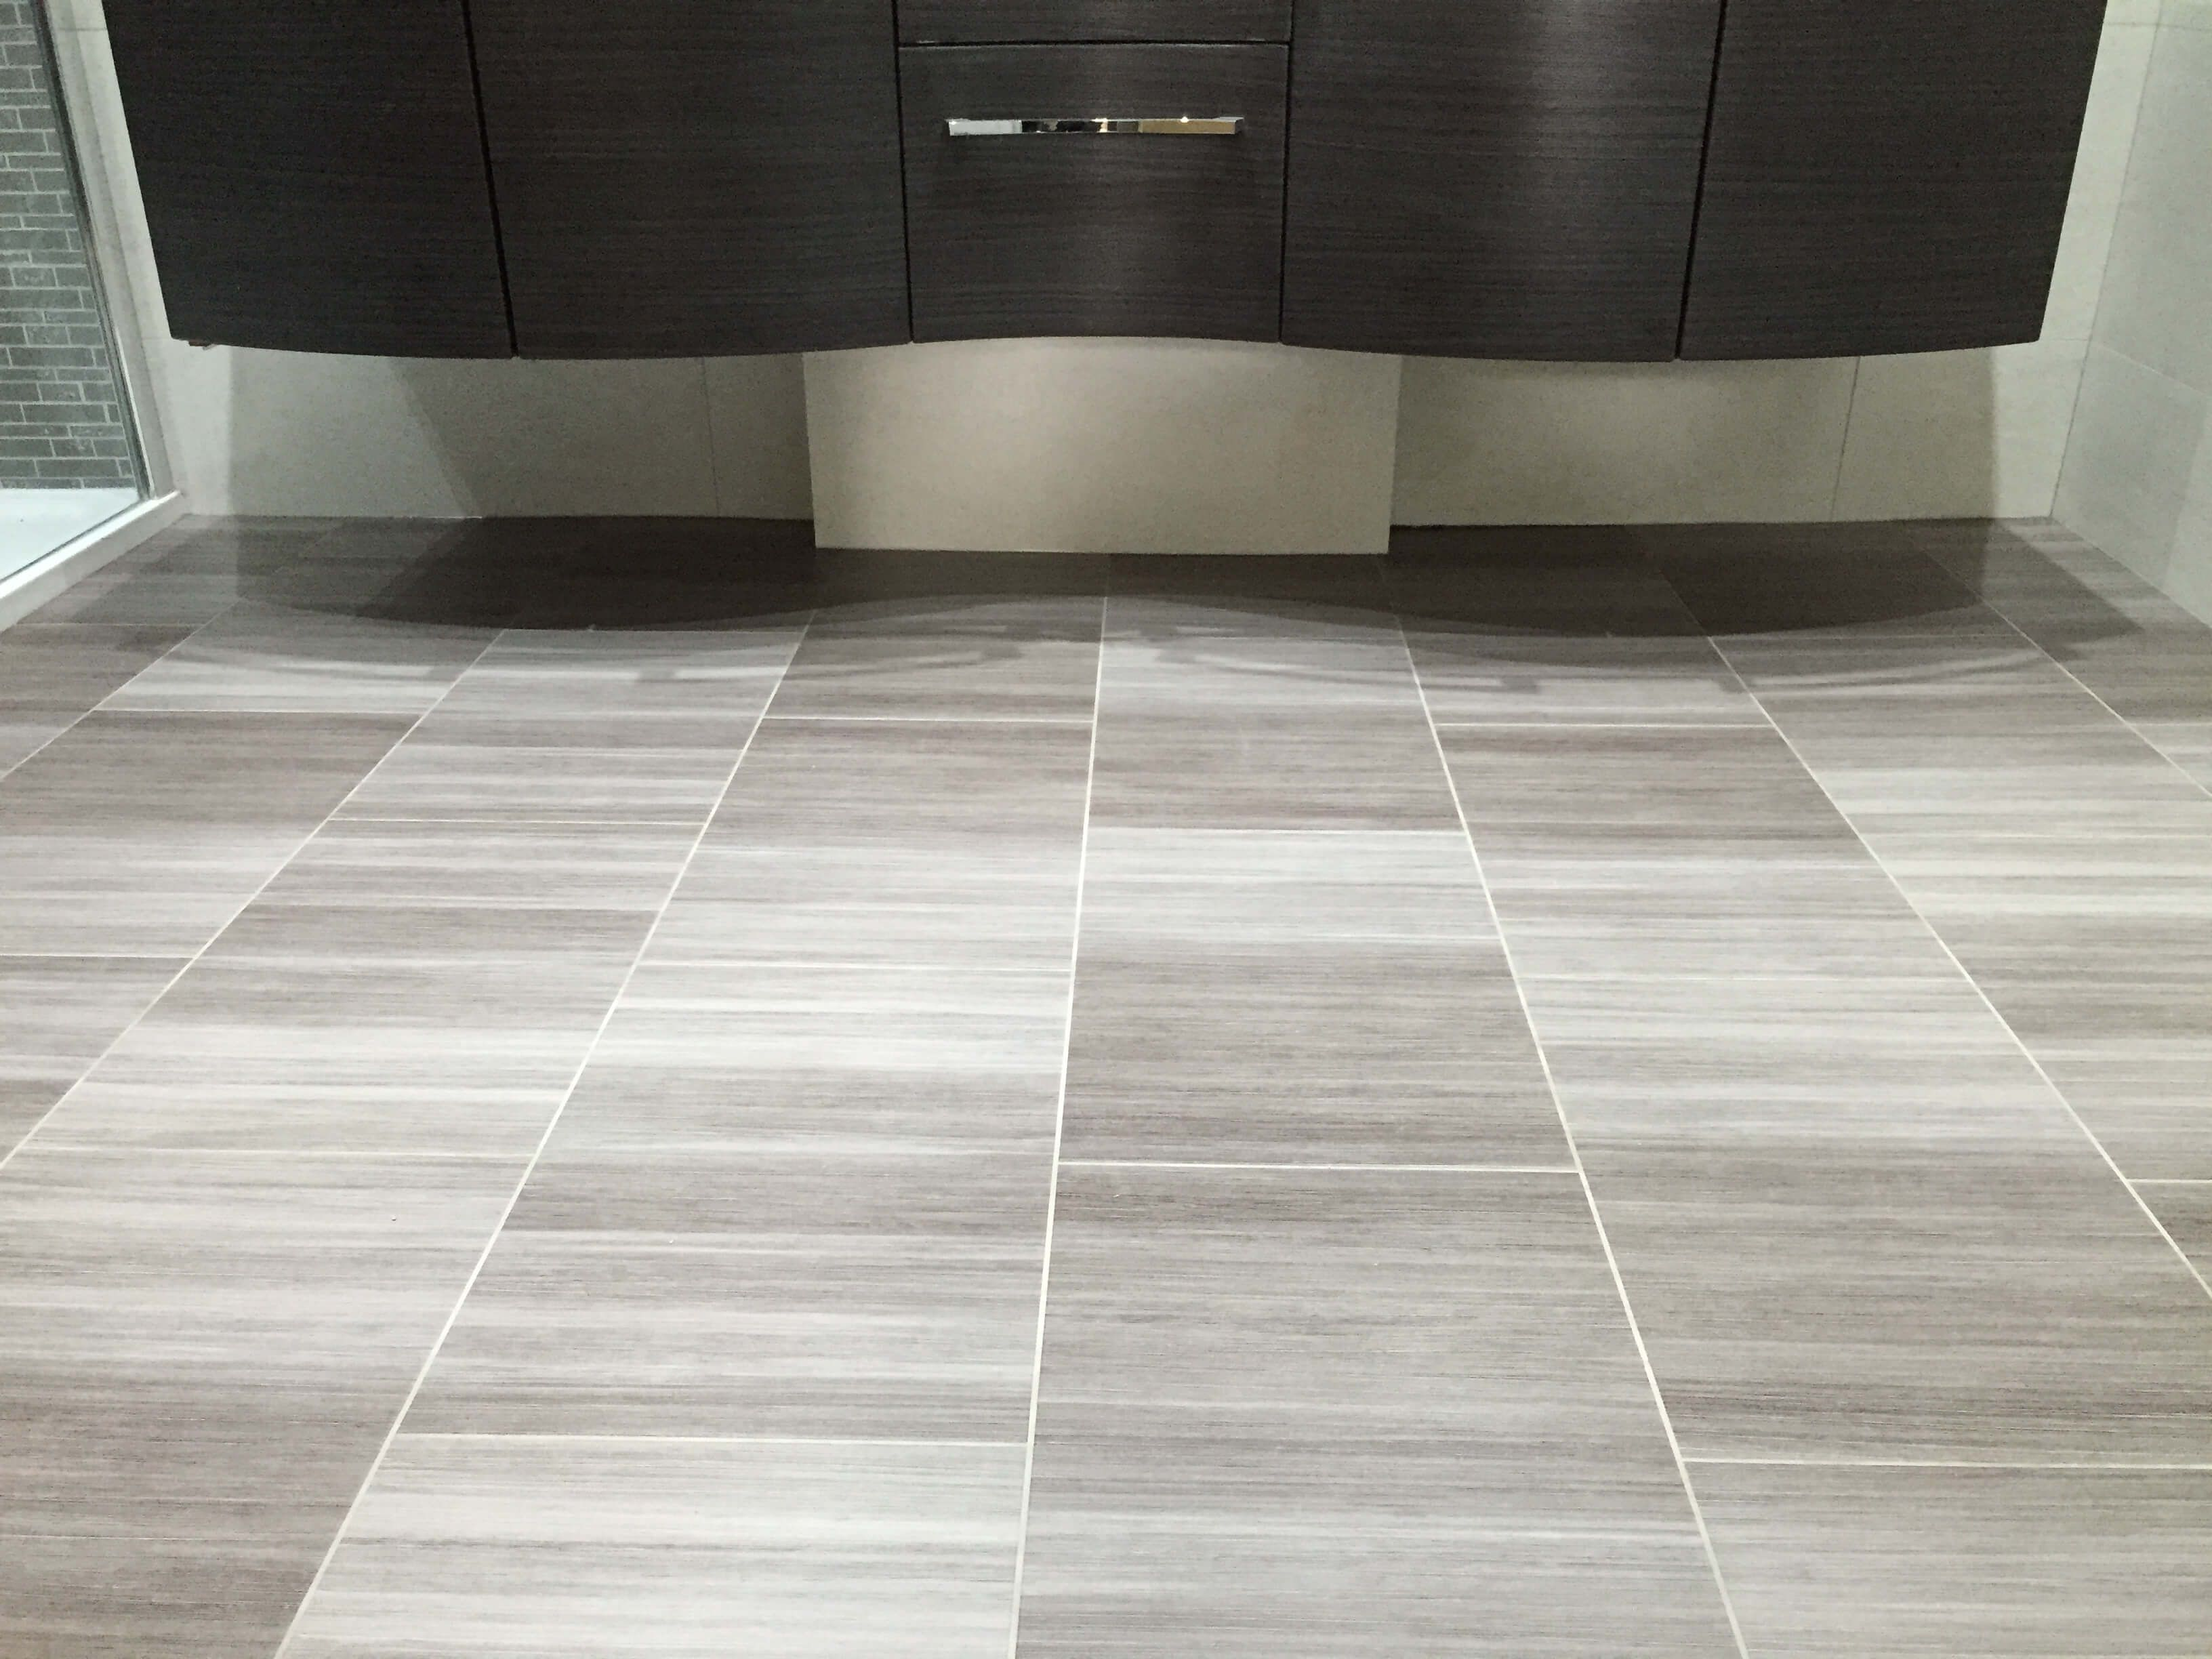 Amtico Bathroom Flooring Spacia Mirrus Hemp Amtico